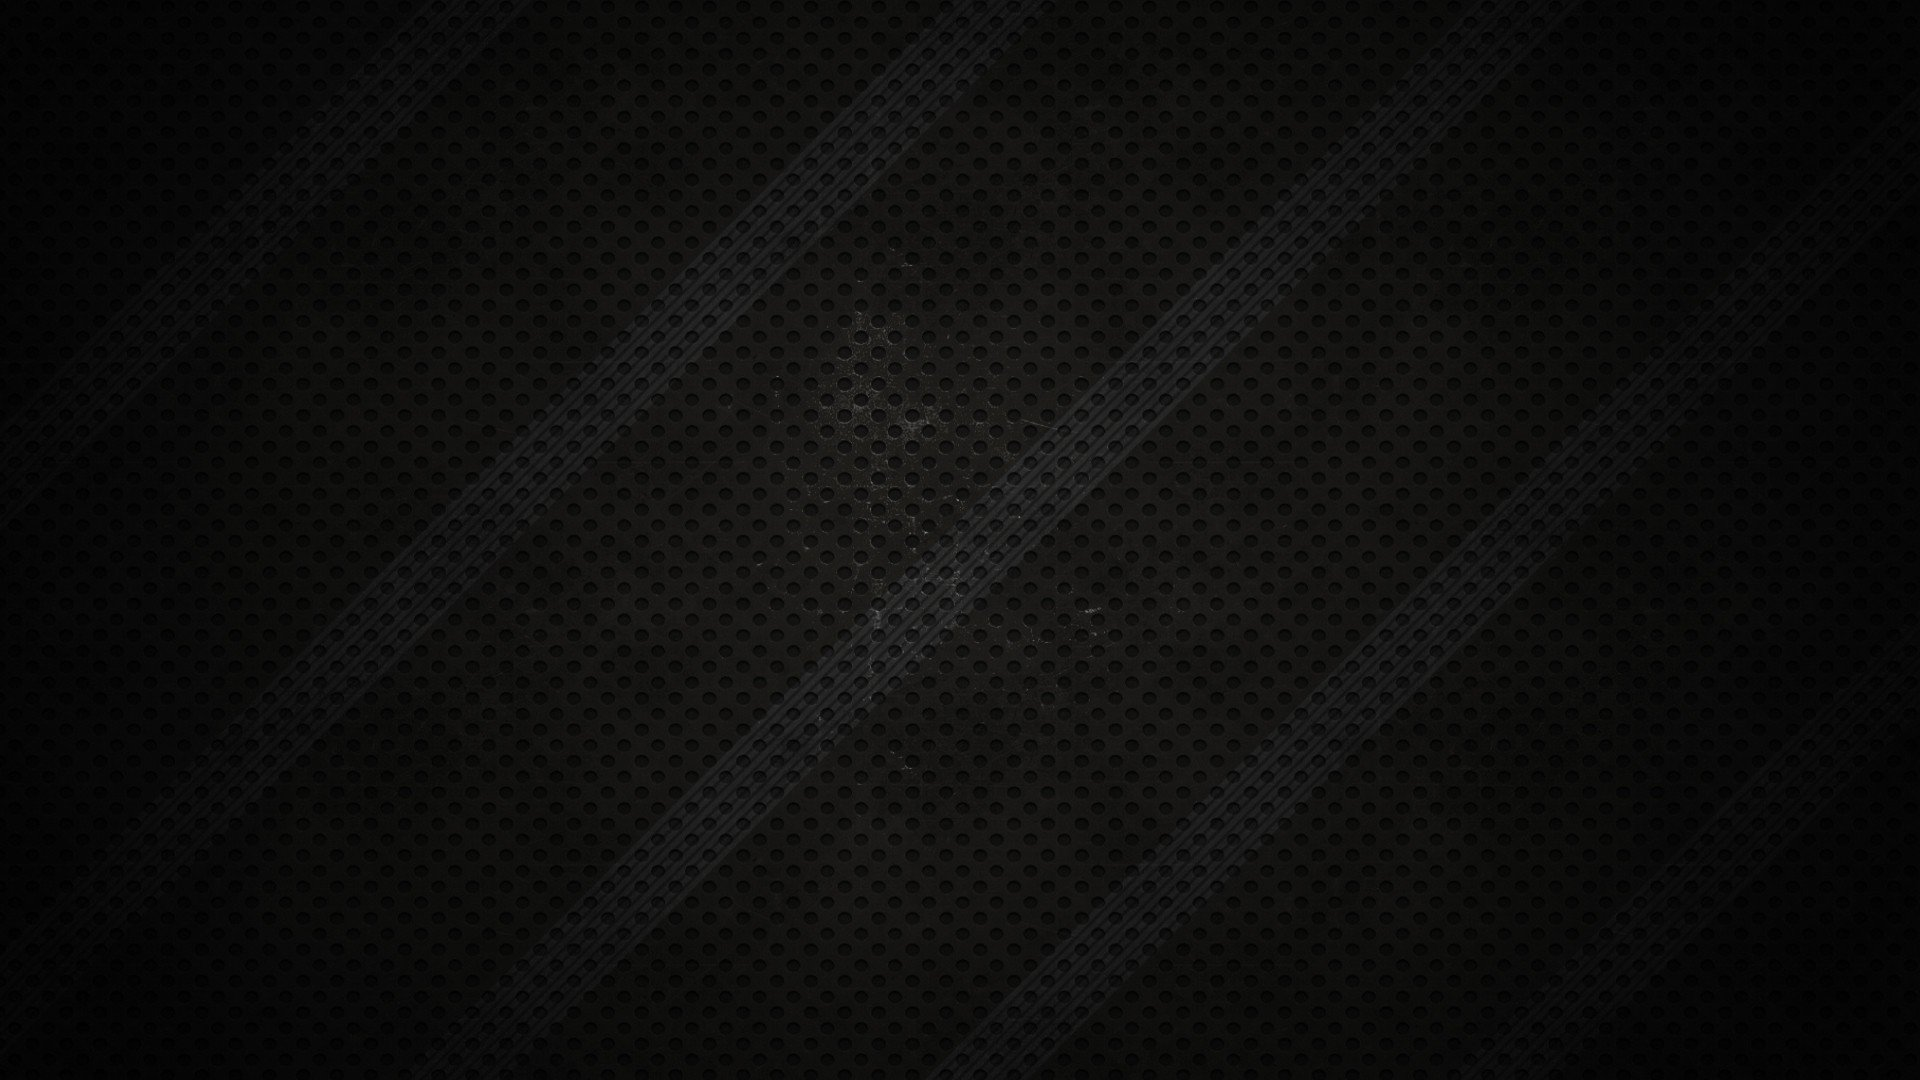 black texture wallpaper 1920x1080 - photo #10